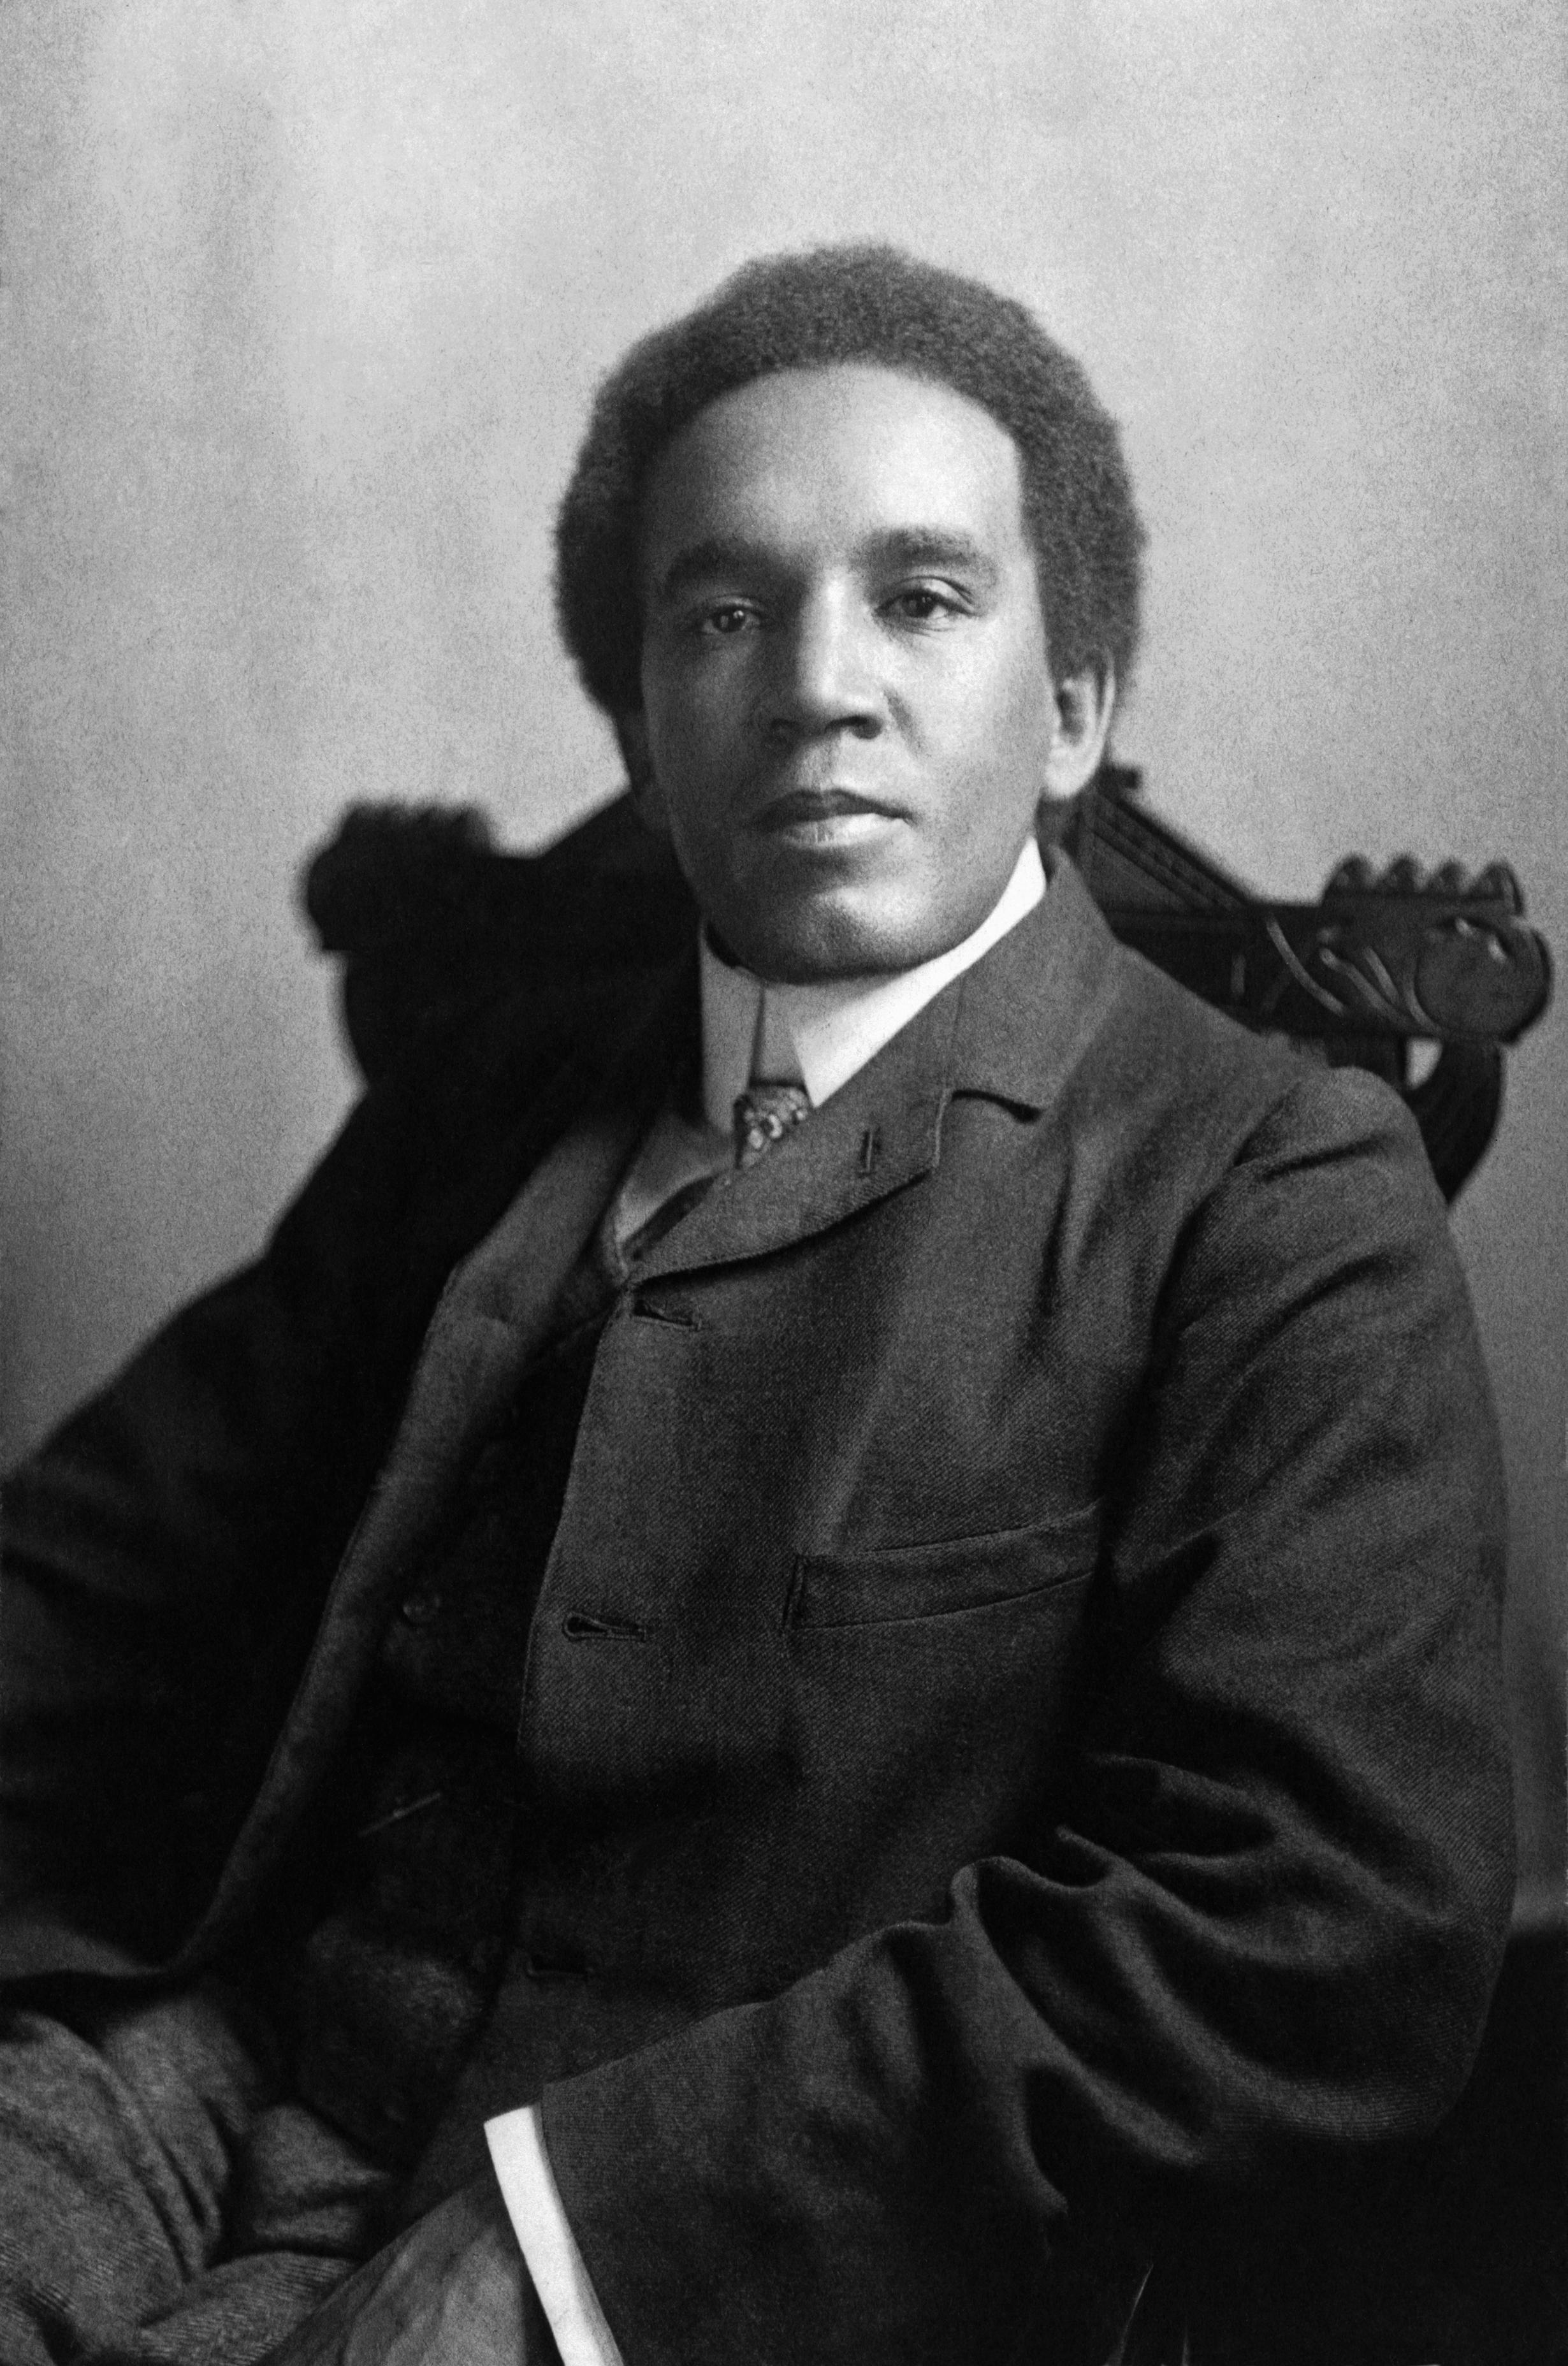 http://upload.wikimedia.org/wikipedia/commons/b/b6/Samuel_Coleridge-Taylor.jpg